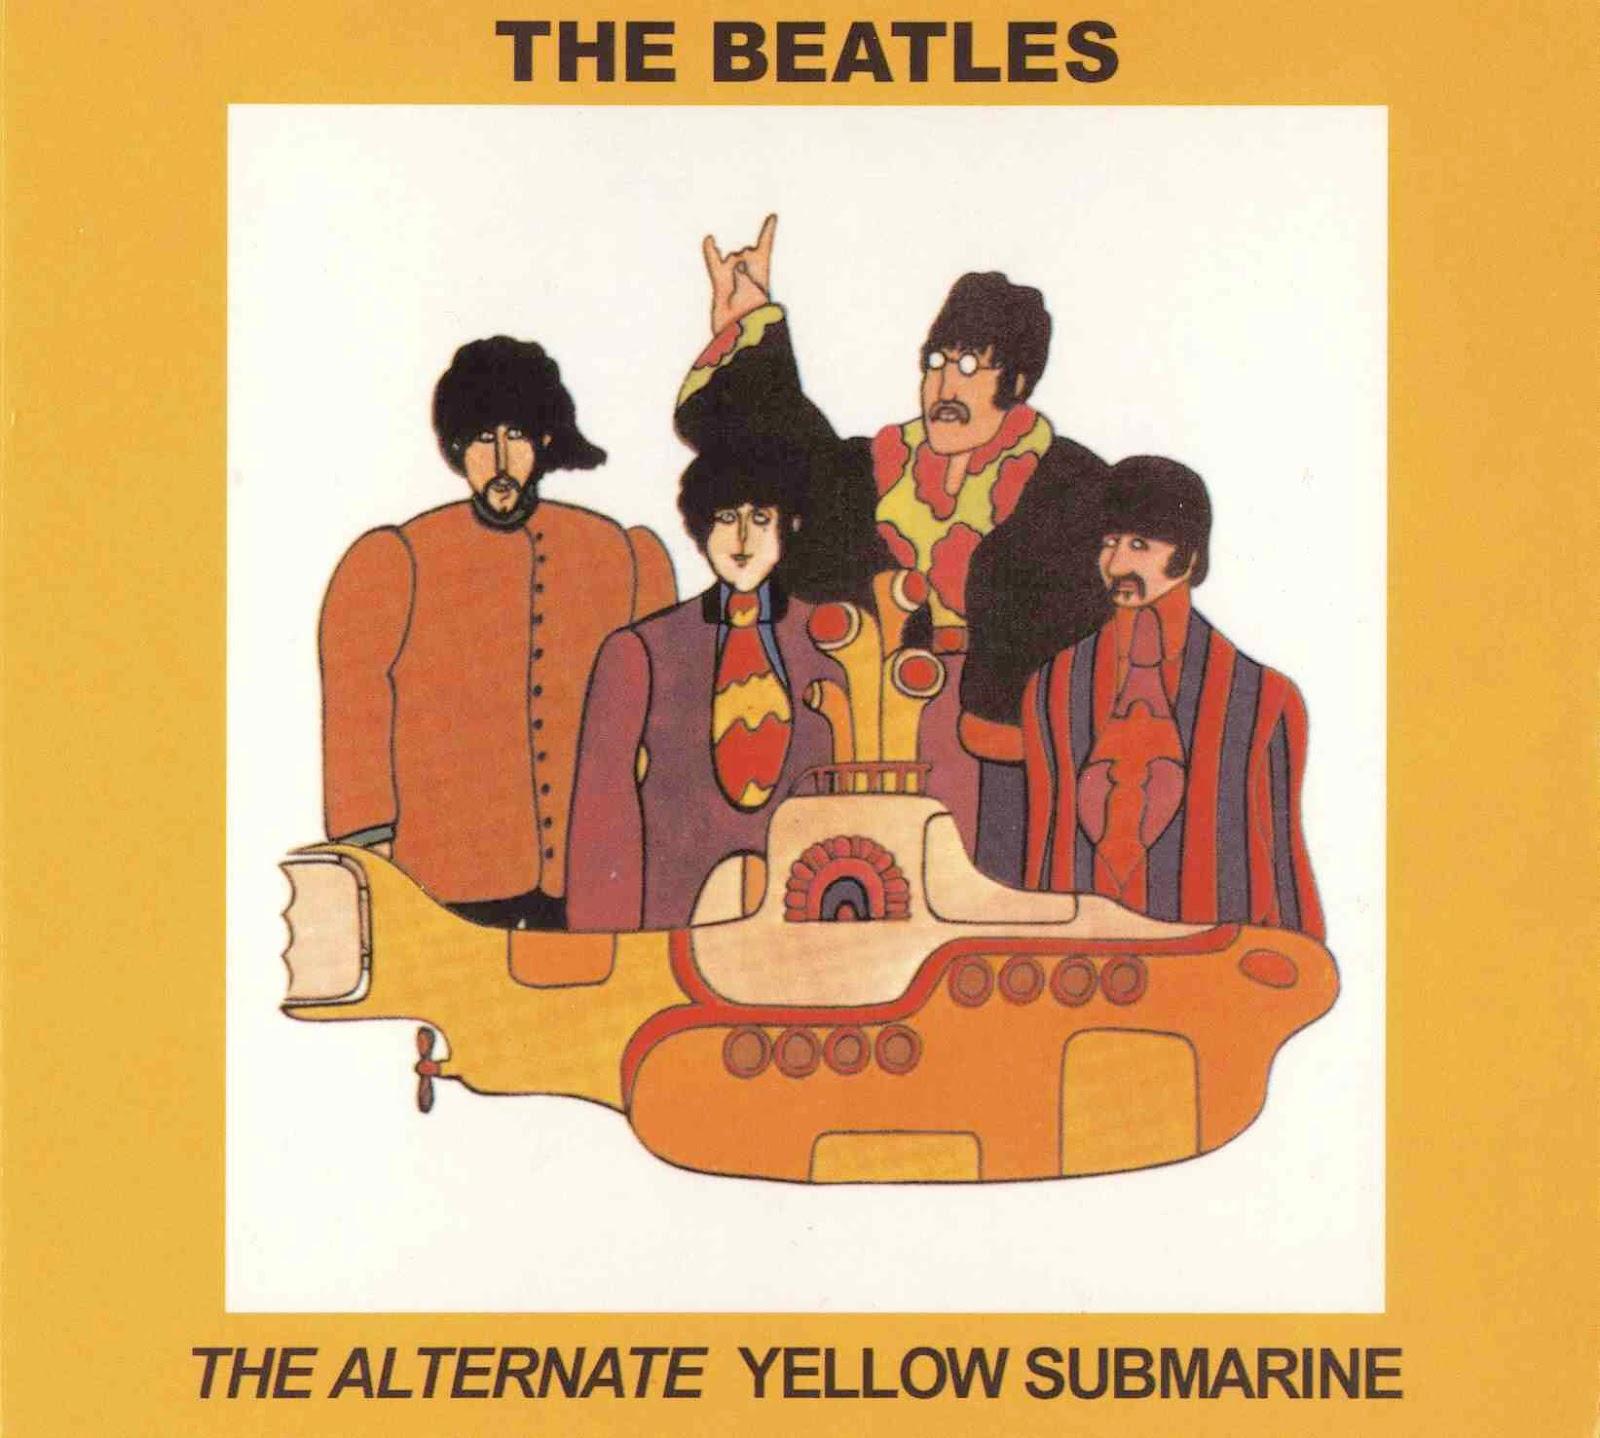 Bootleg Addiction Beatles The Alternate Yellow Submarine